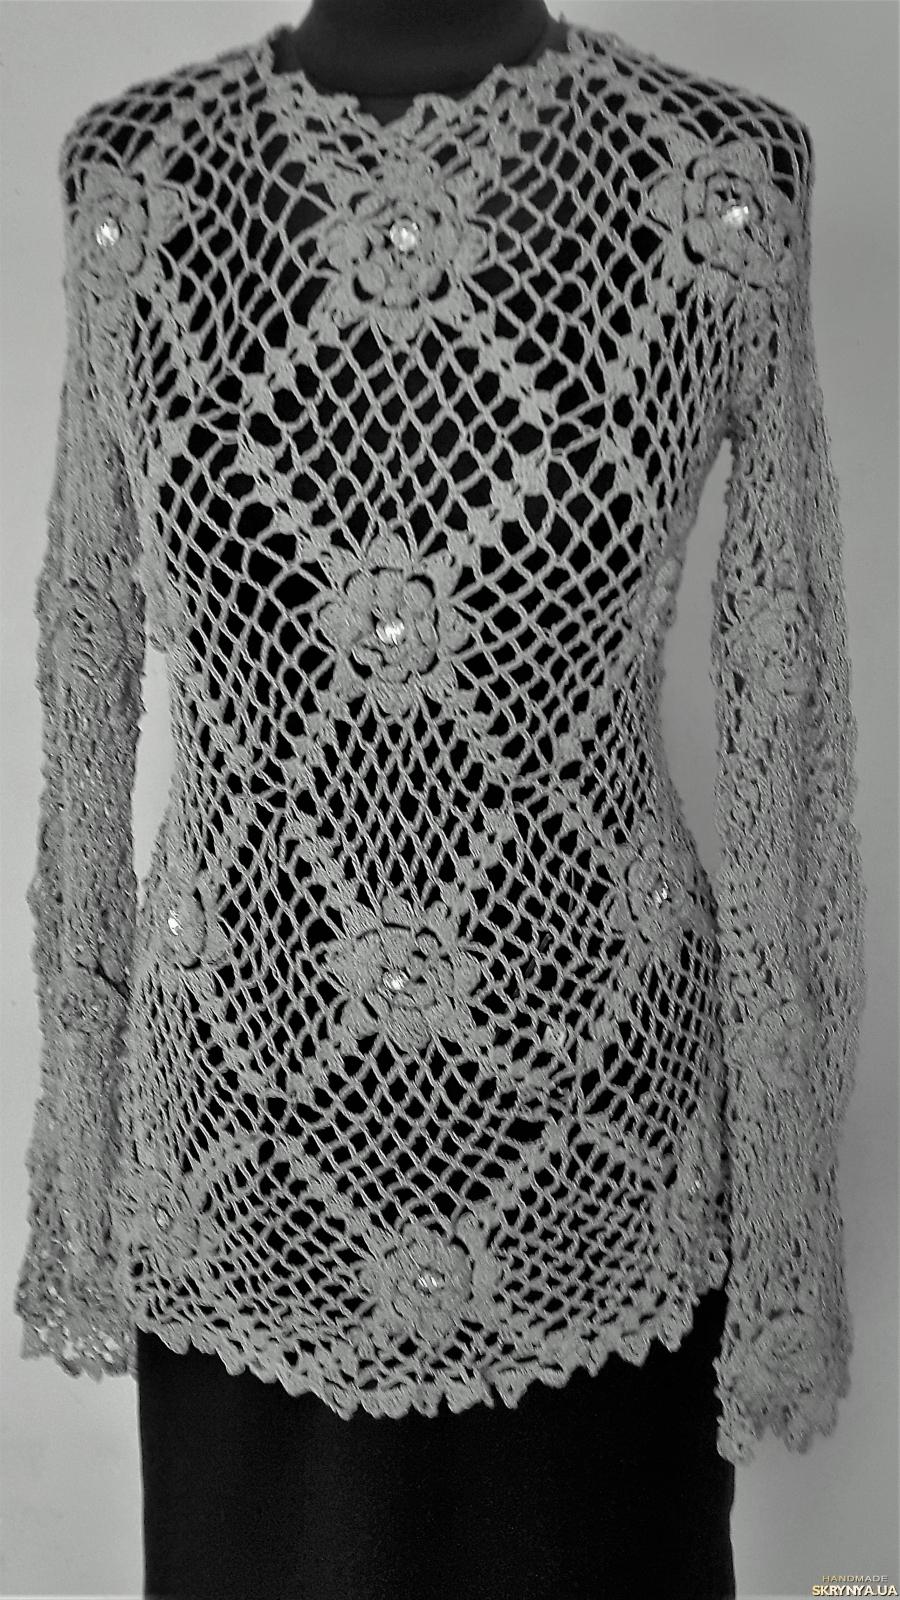 pictured here Ажурная вязанная туника серо-стального цвета на 46 - 50 р-р.